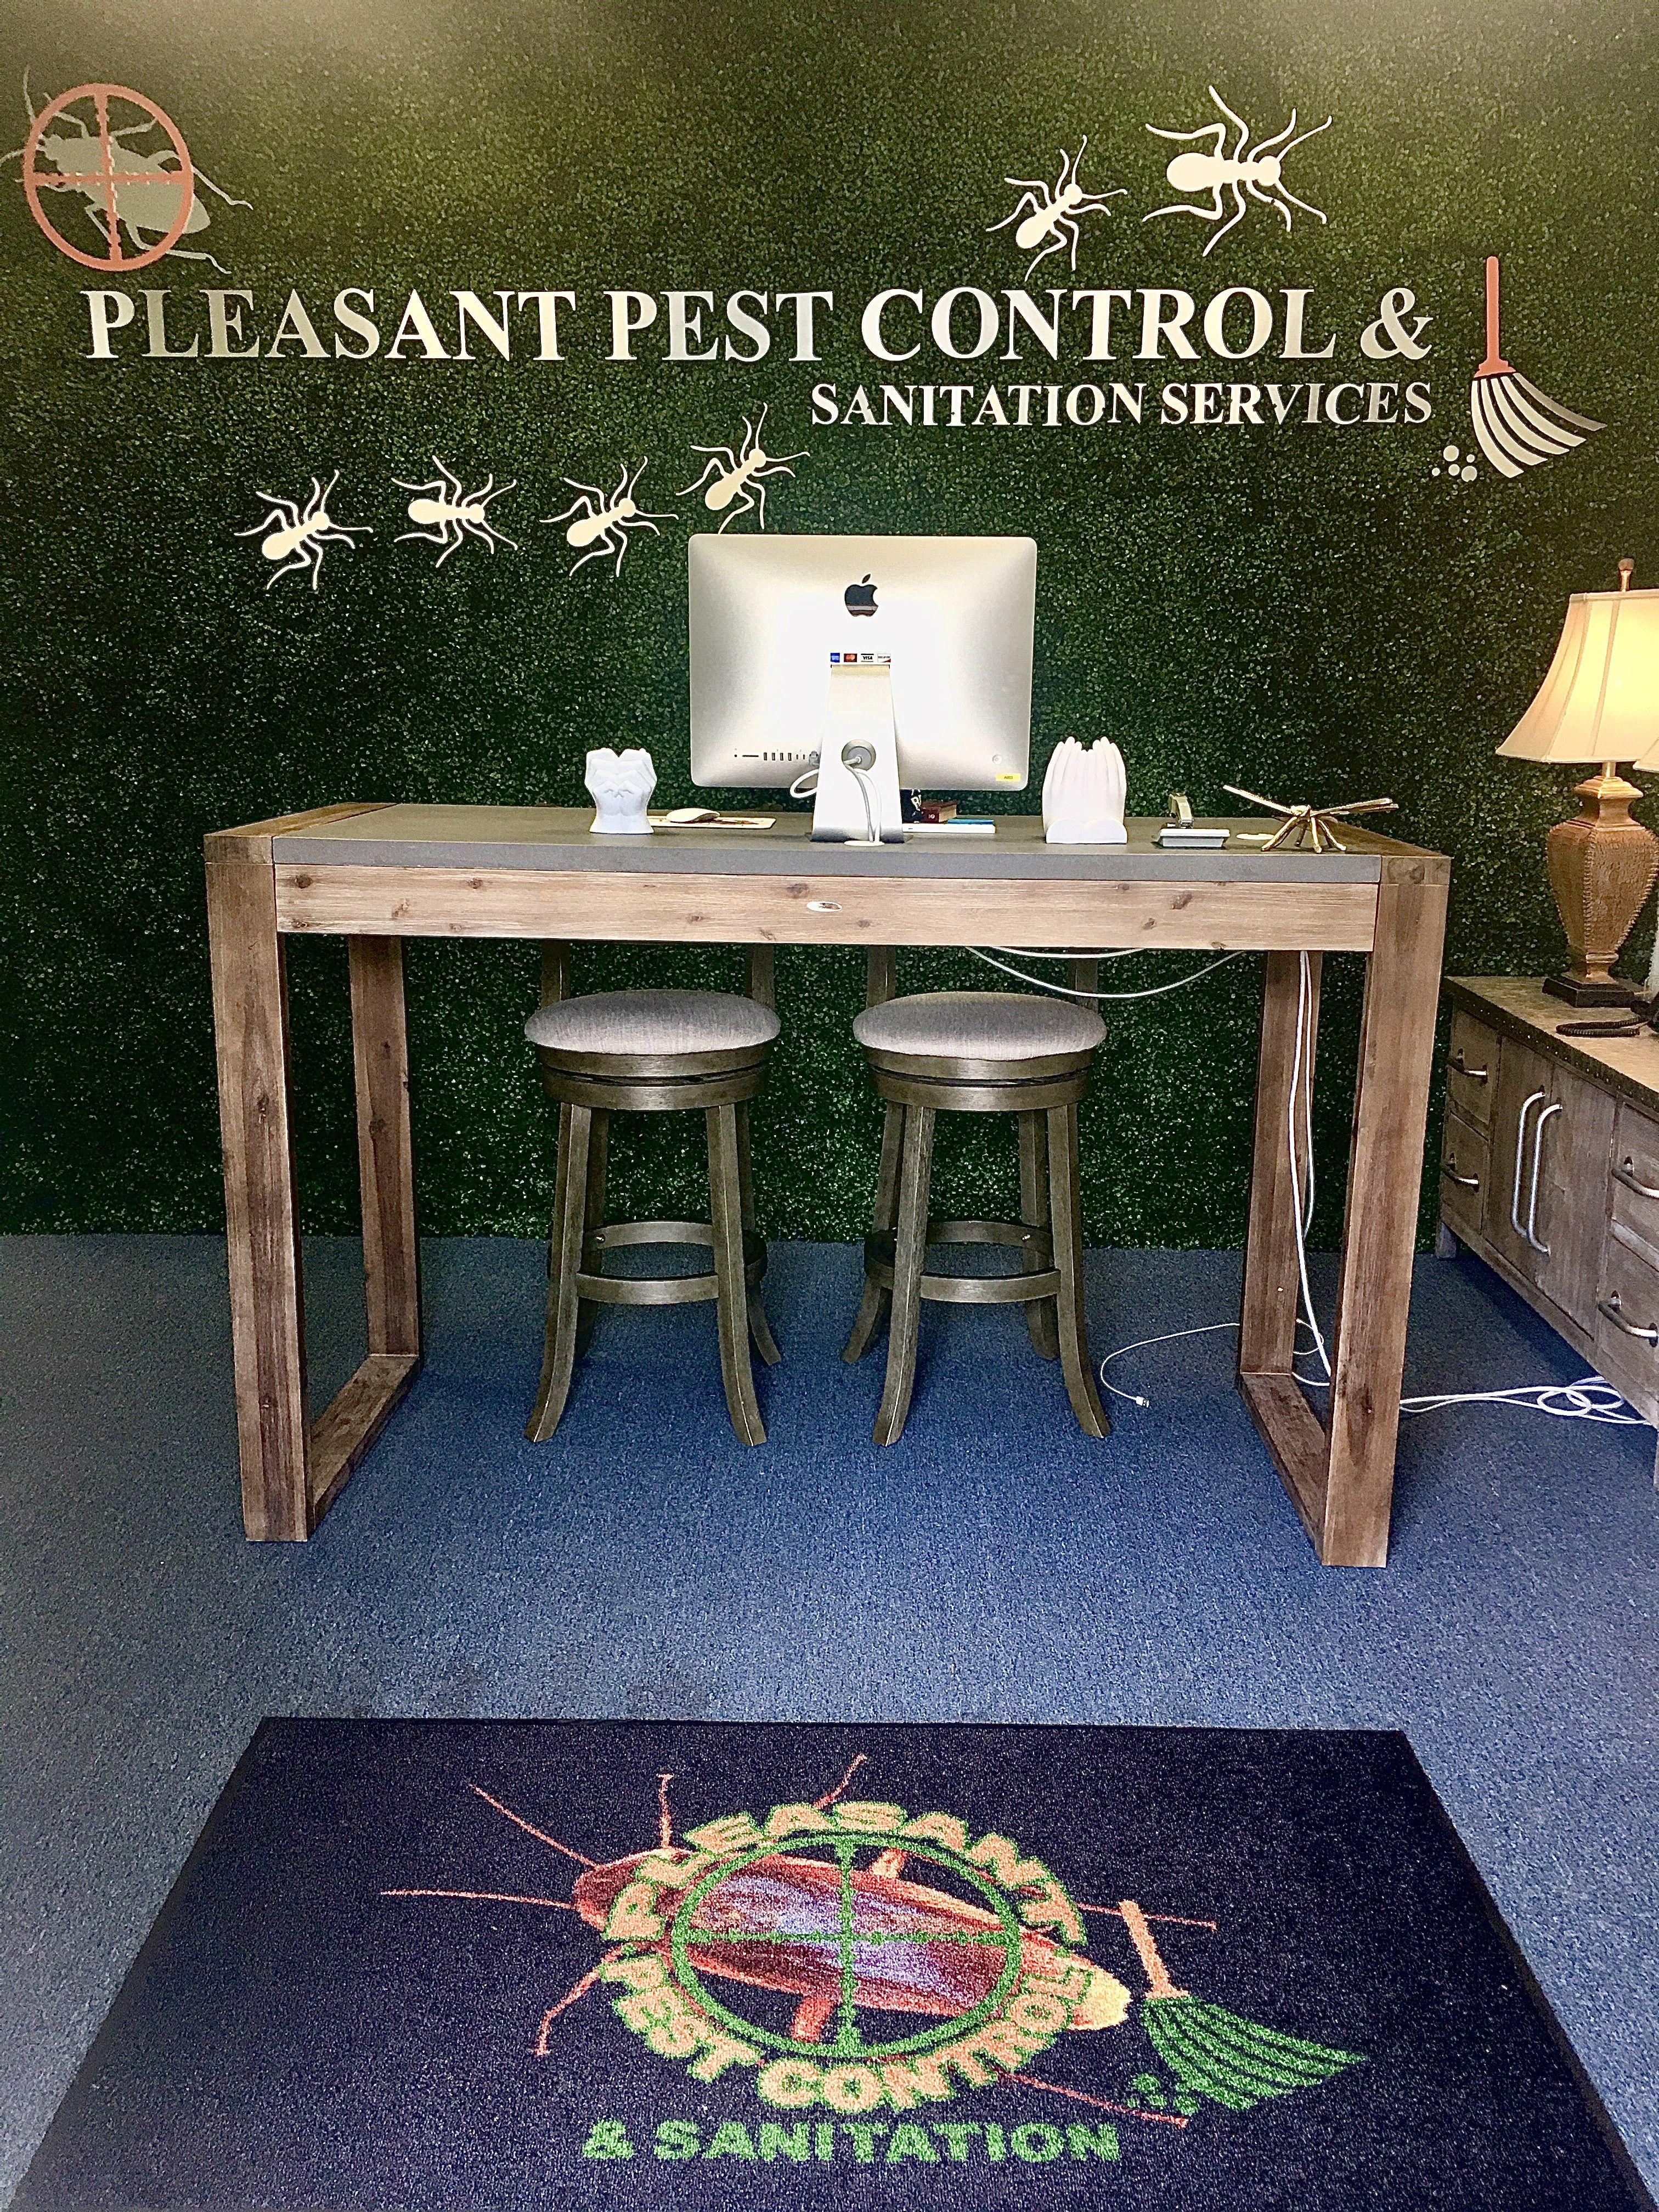 Custom Logo Rugs Custom Rugs Pest Control Custom Logos